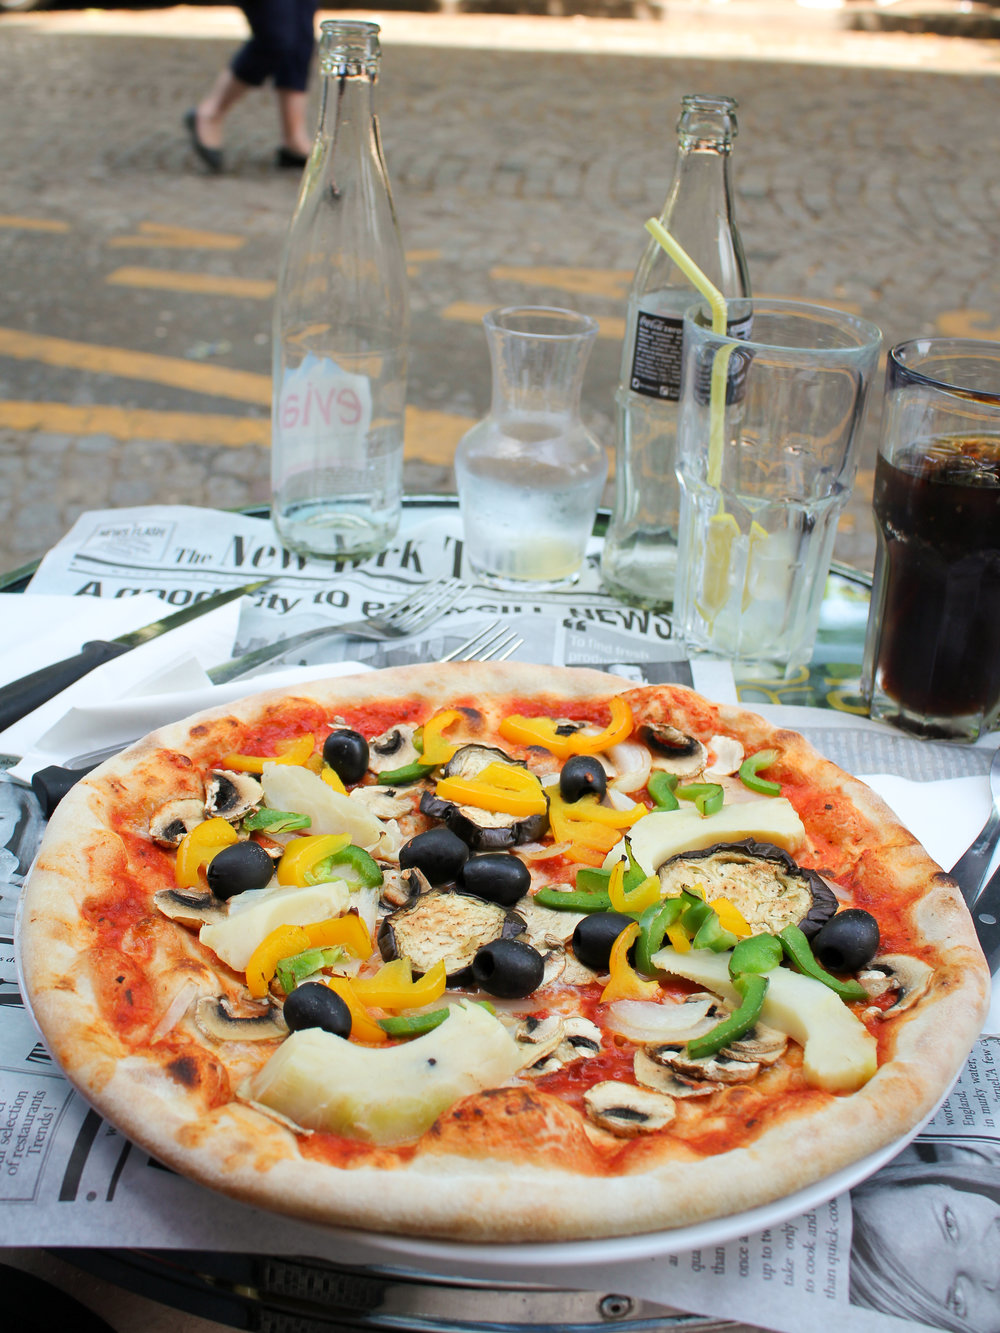 vegetarian pizza (minus the mozzarella) from the Studio Cafe